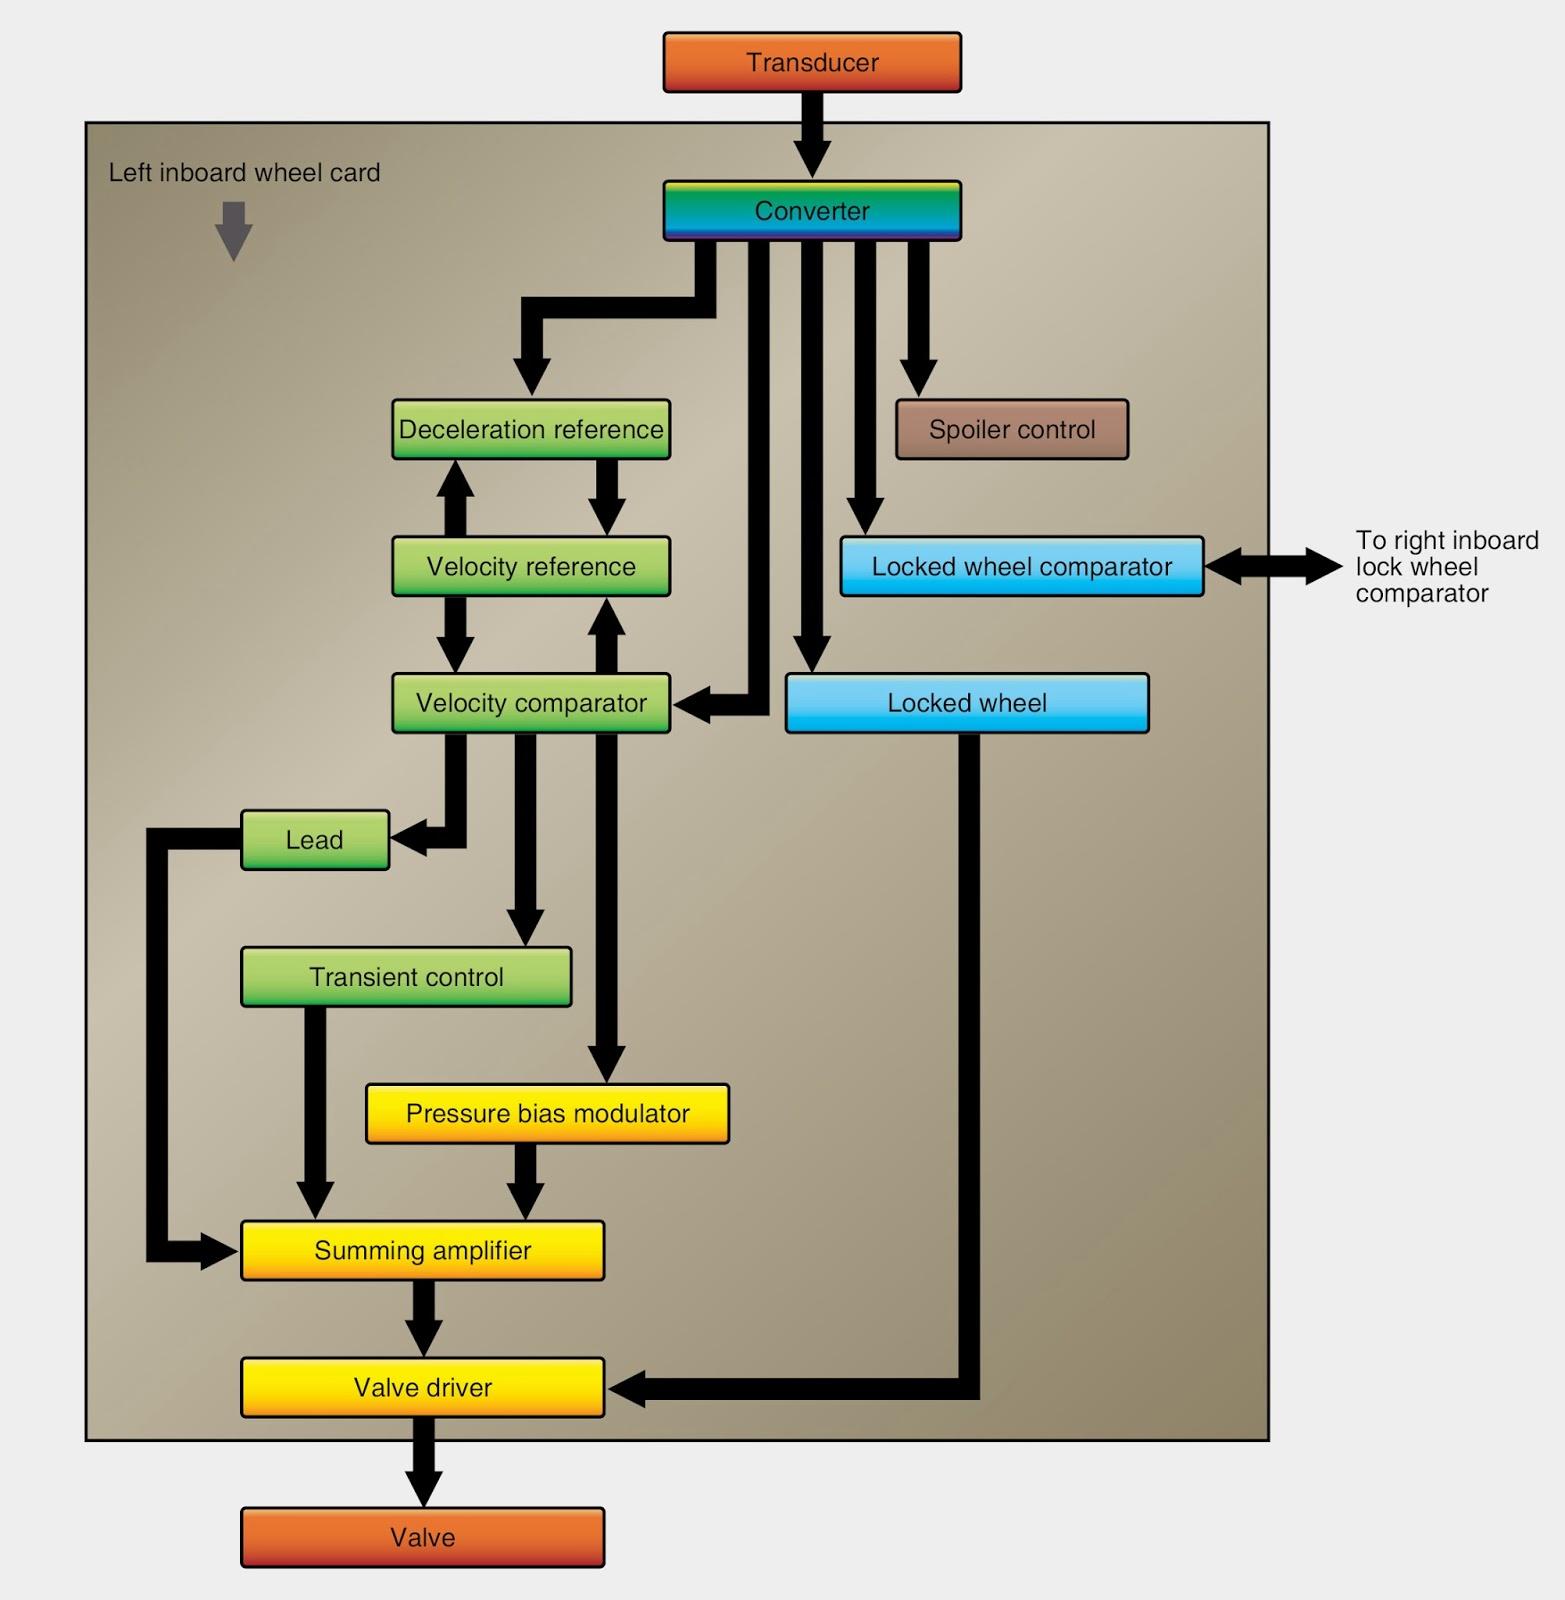 prodigy p2 generic wiring guide prodigy image 7 pin wiring diagram prodigy 7 auto wiring diagram schematic on prodigy p2 generic wiring guide